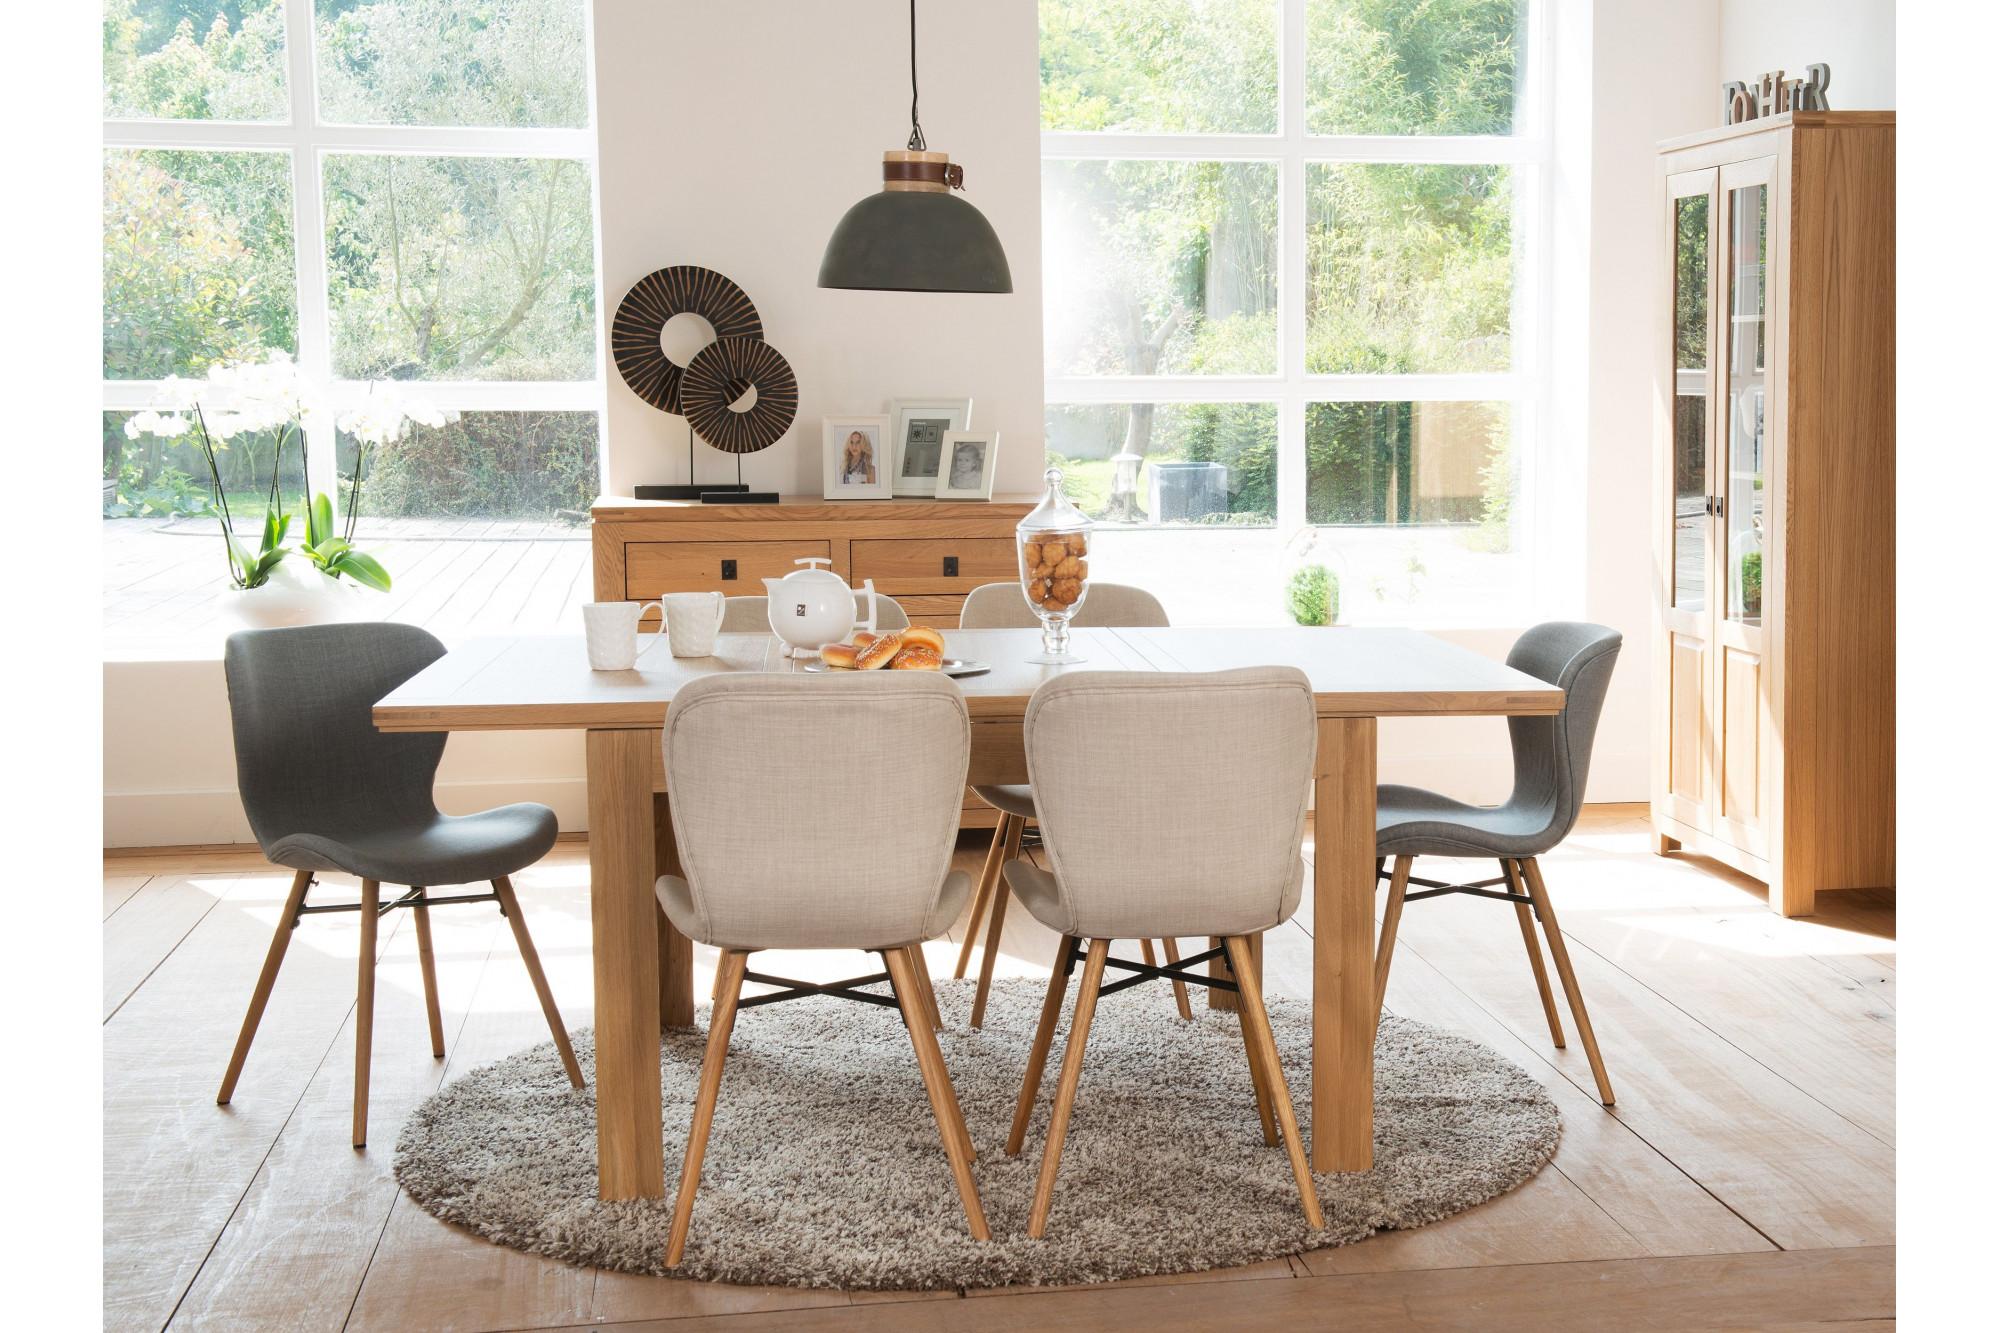 extensible de moderne à en chene Table manger HELLIN salle wNmvnO80